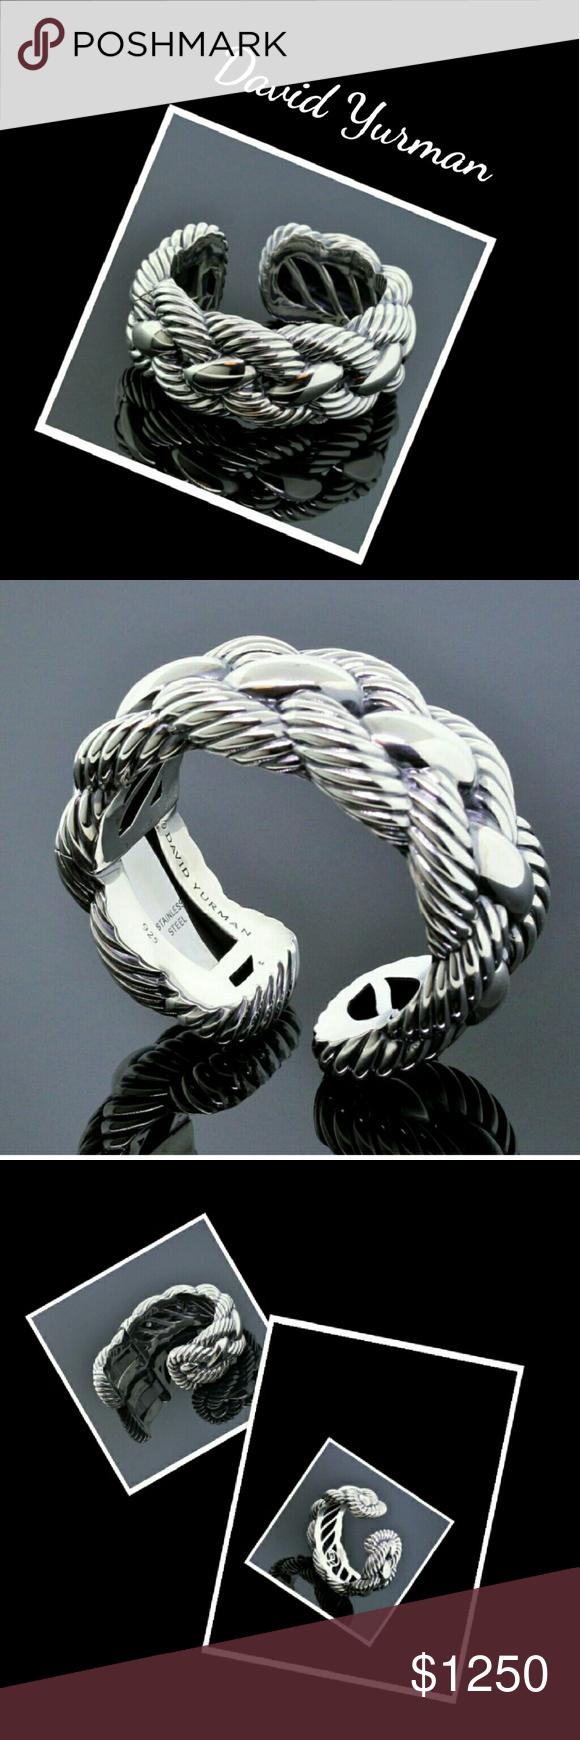 David Yurman NO Trades Authentic 25 MM Wide Hinge Cable Bracelet  Sales Only Siver EUC Preloved Gently David Yurman Jewelry Bracelets